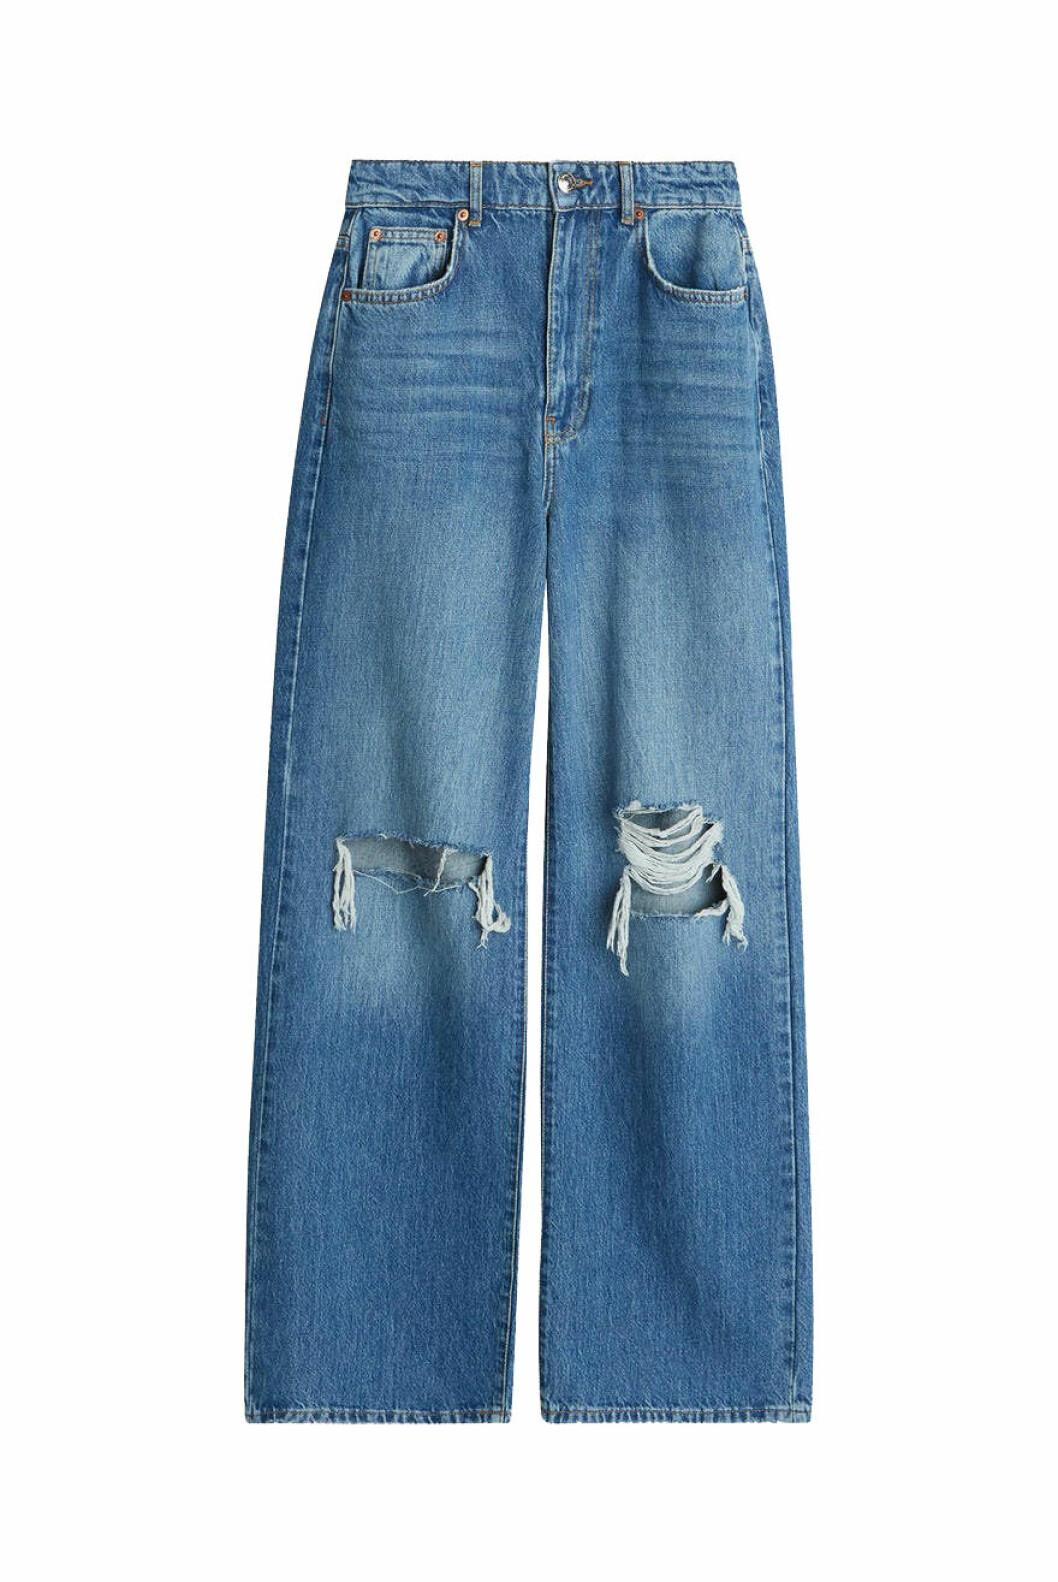 jeans från gina tricot.